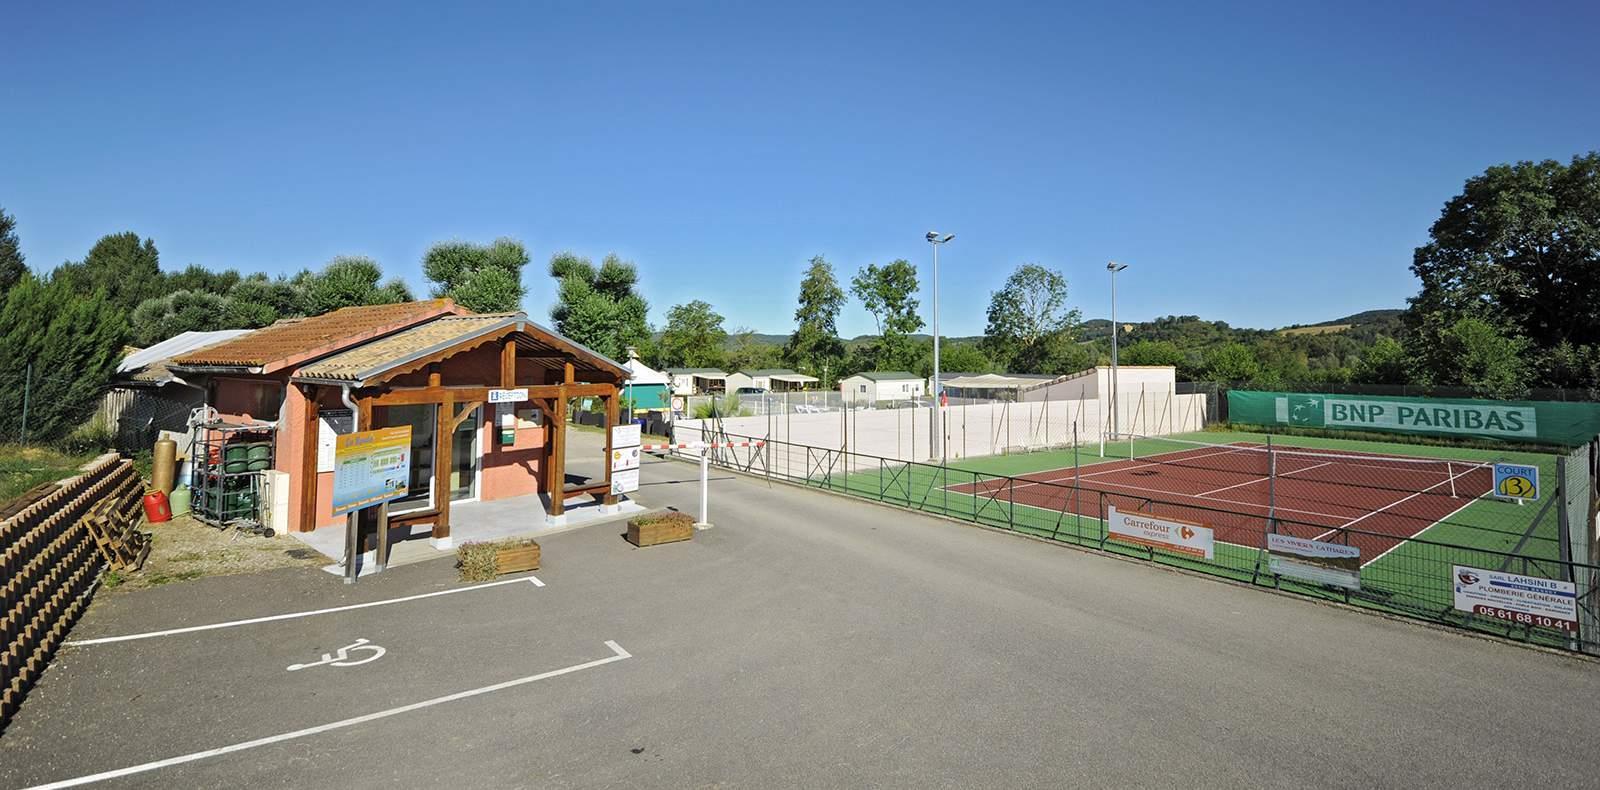 Camping les Nysades, Mirepoix, Ariège